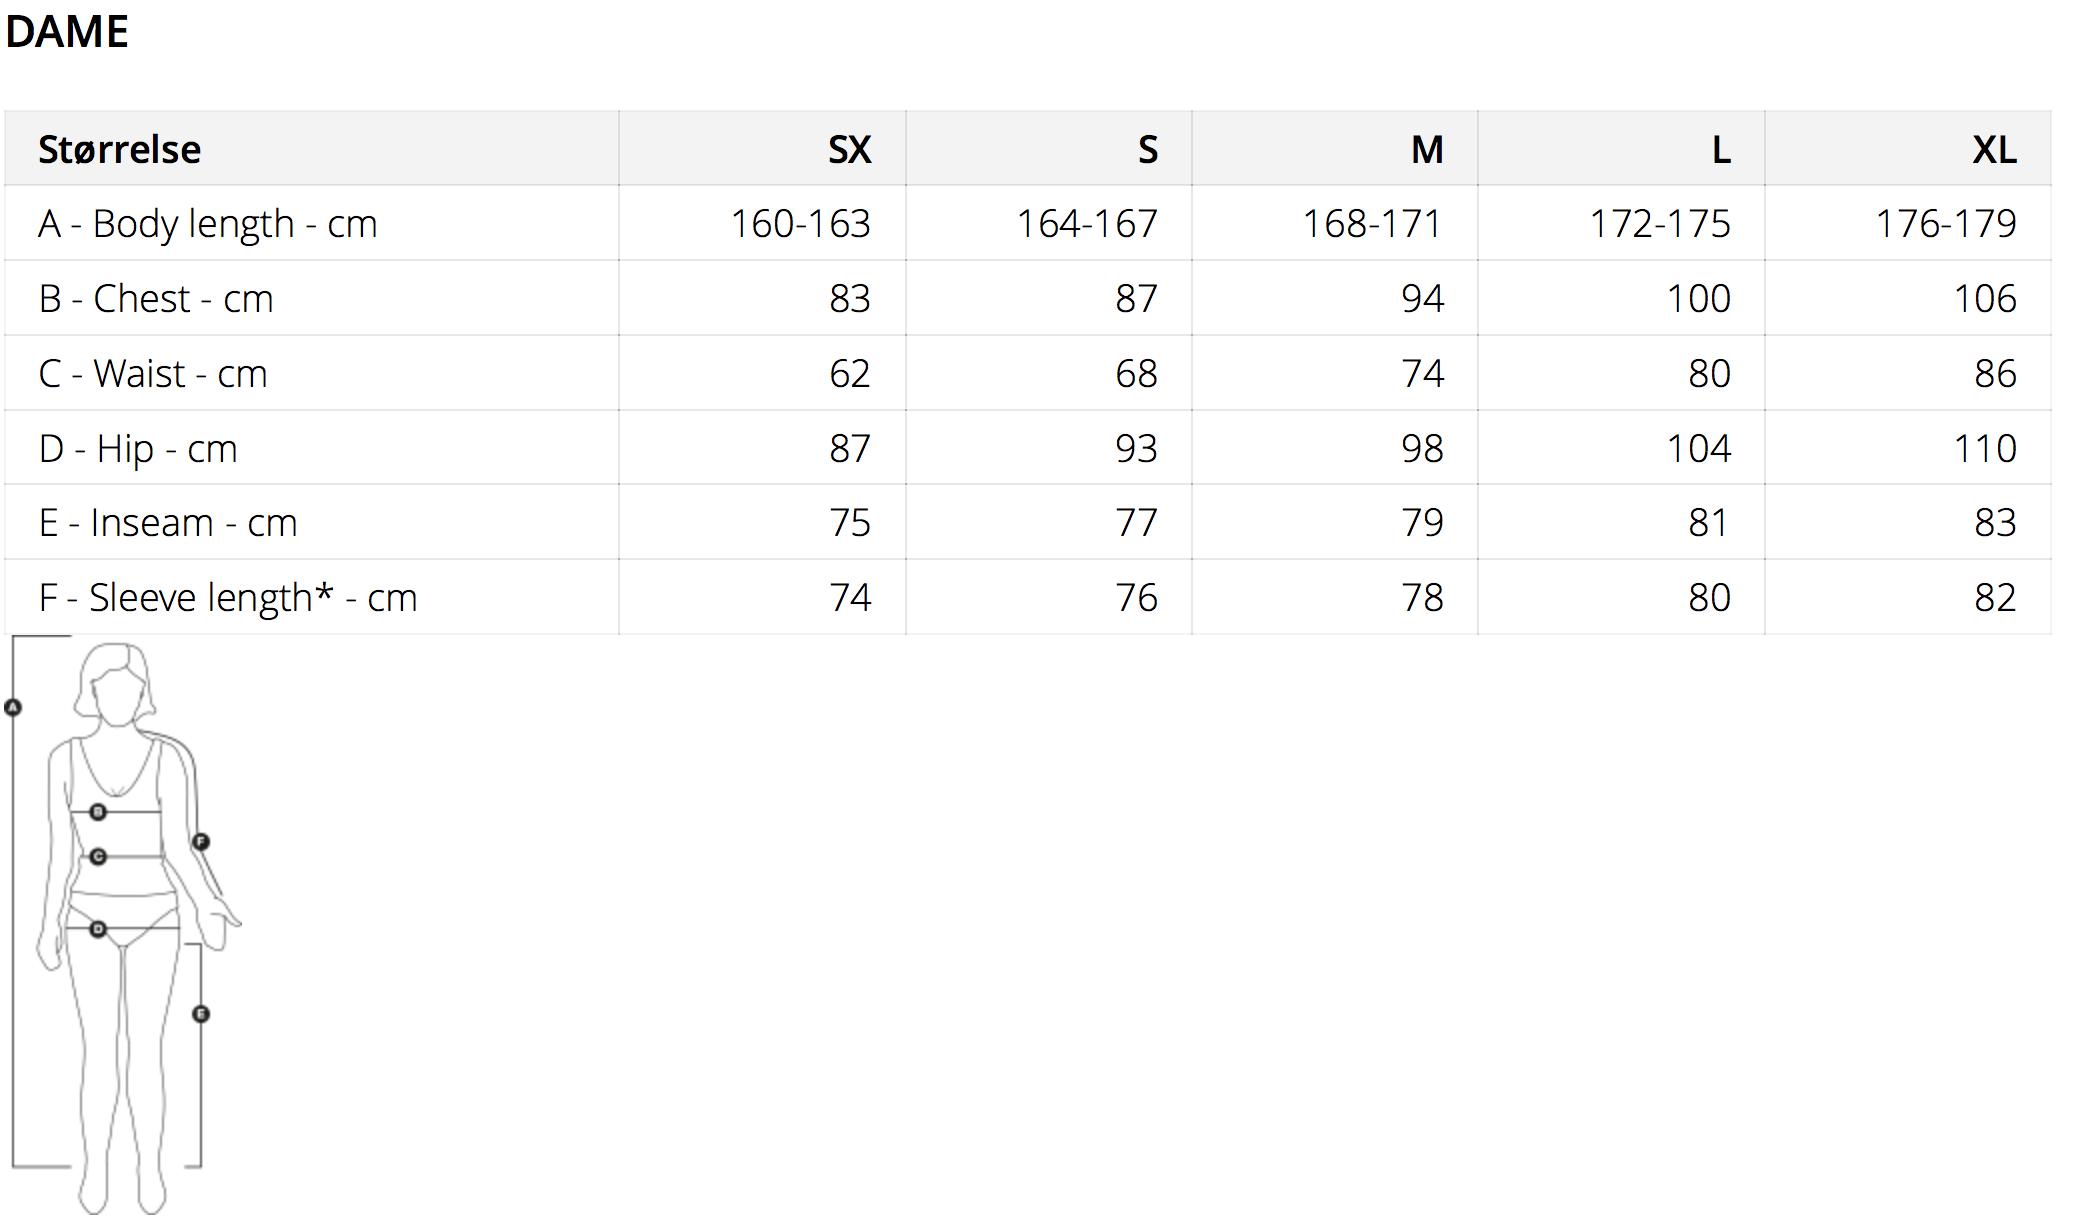 c170c1e5 Ulvang skiundertøj størrelsesguide / size chart / storleksguide -  Skiwear4u.dk